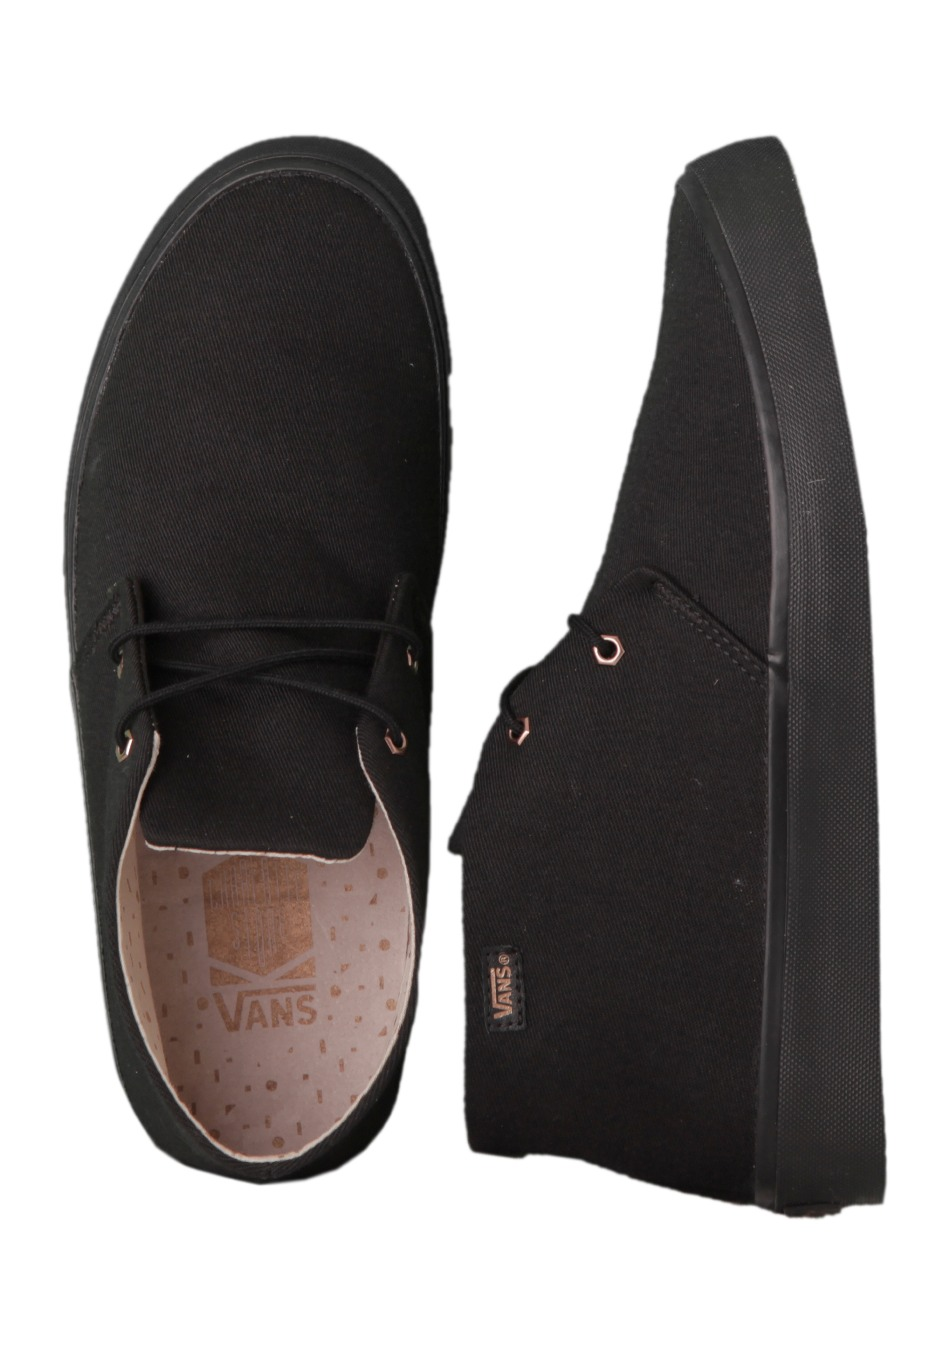 1d1bf4329f81 Vans - Rhea SF Charlotte Stone - Girl Shoes - Impericon.com UK